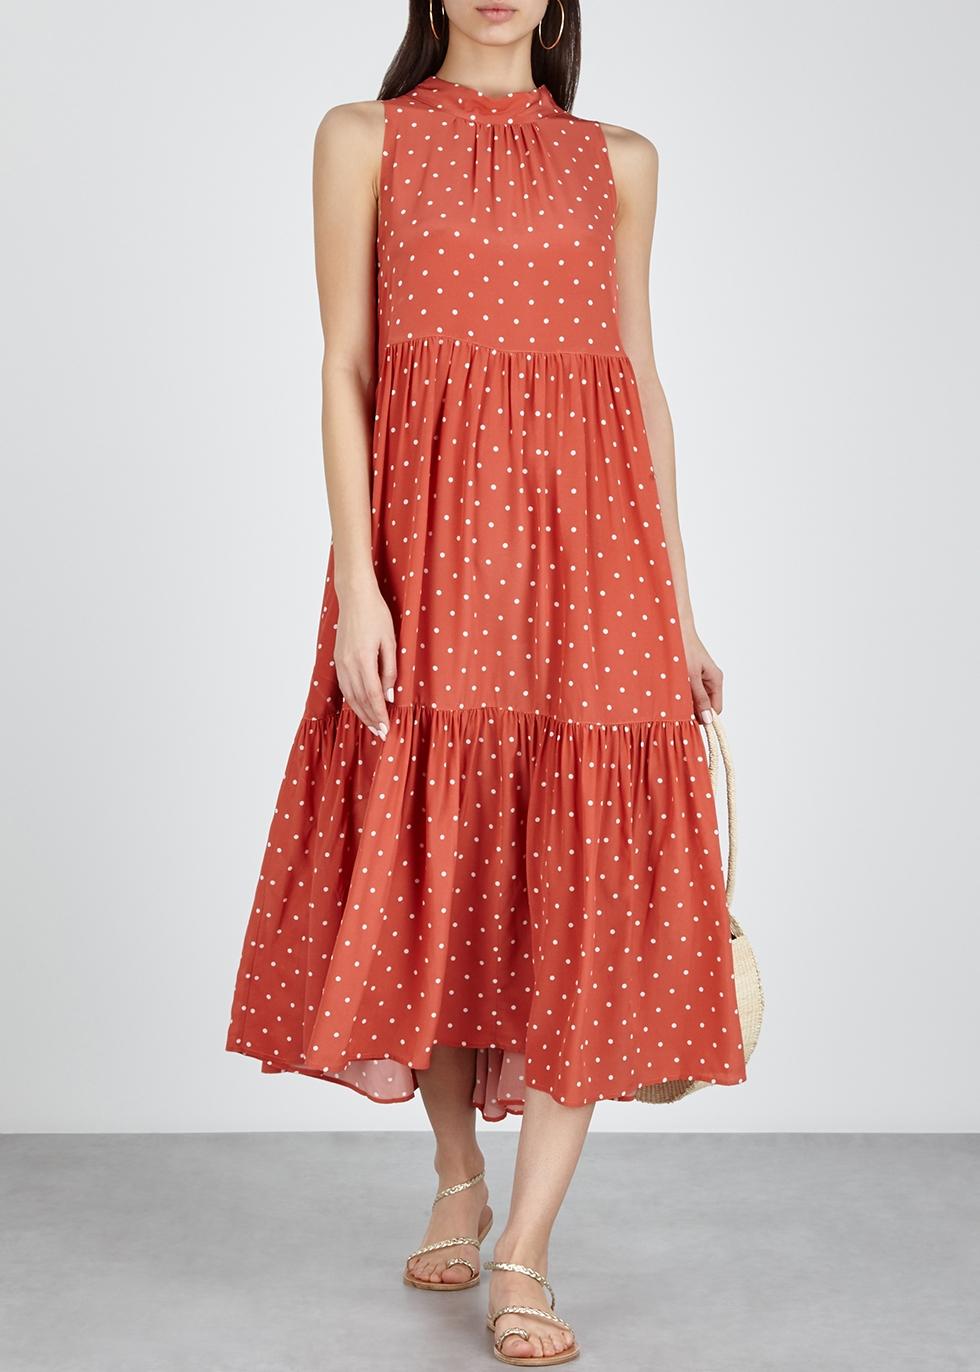 0aa0f8cb33 Women s Designer Clothing